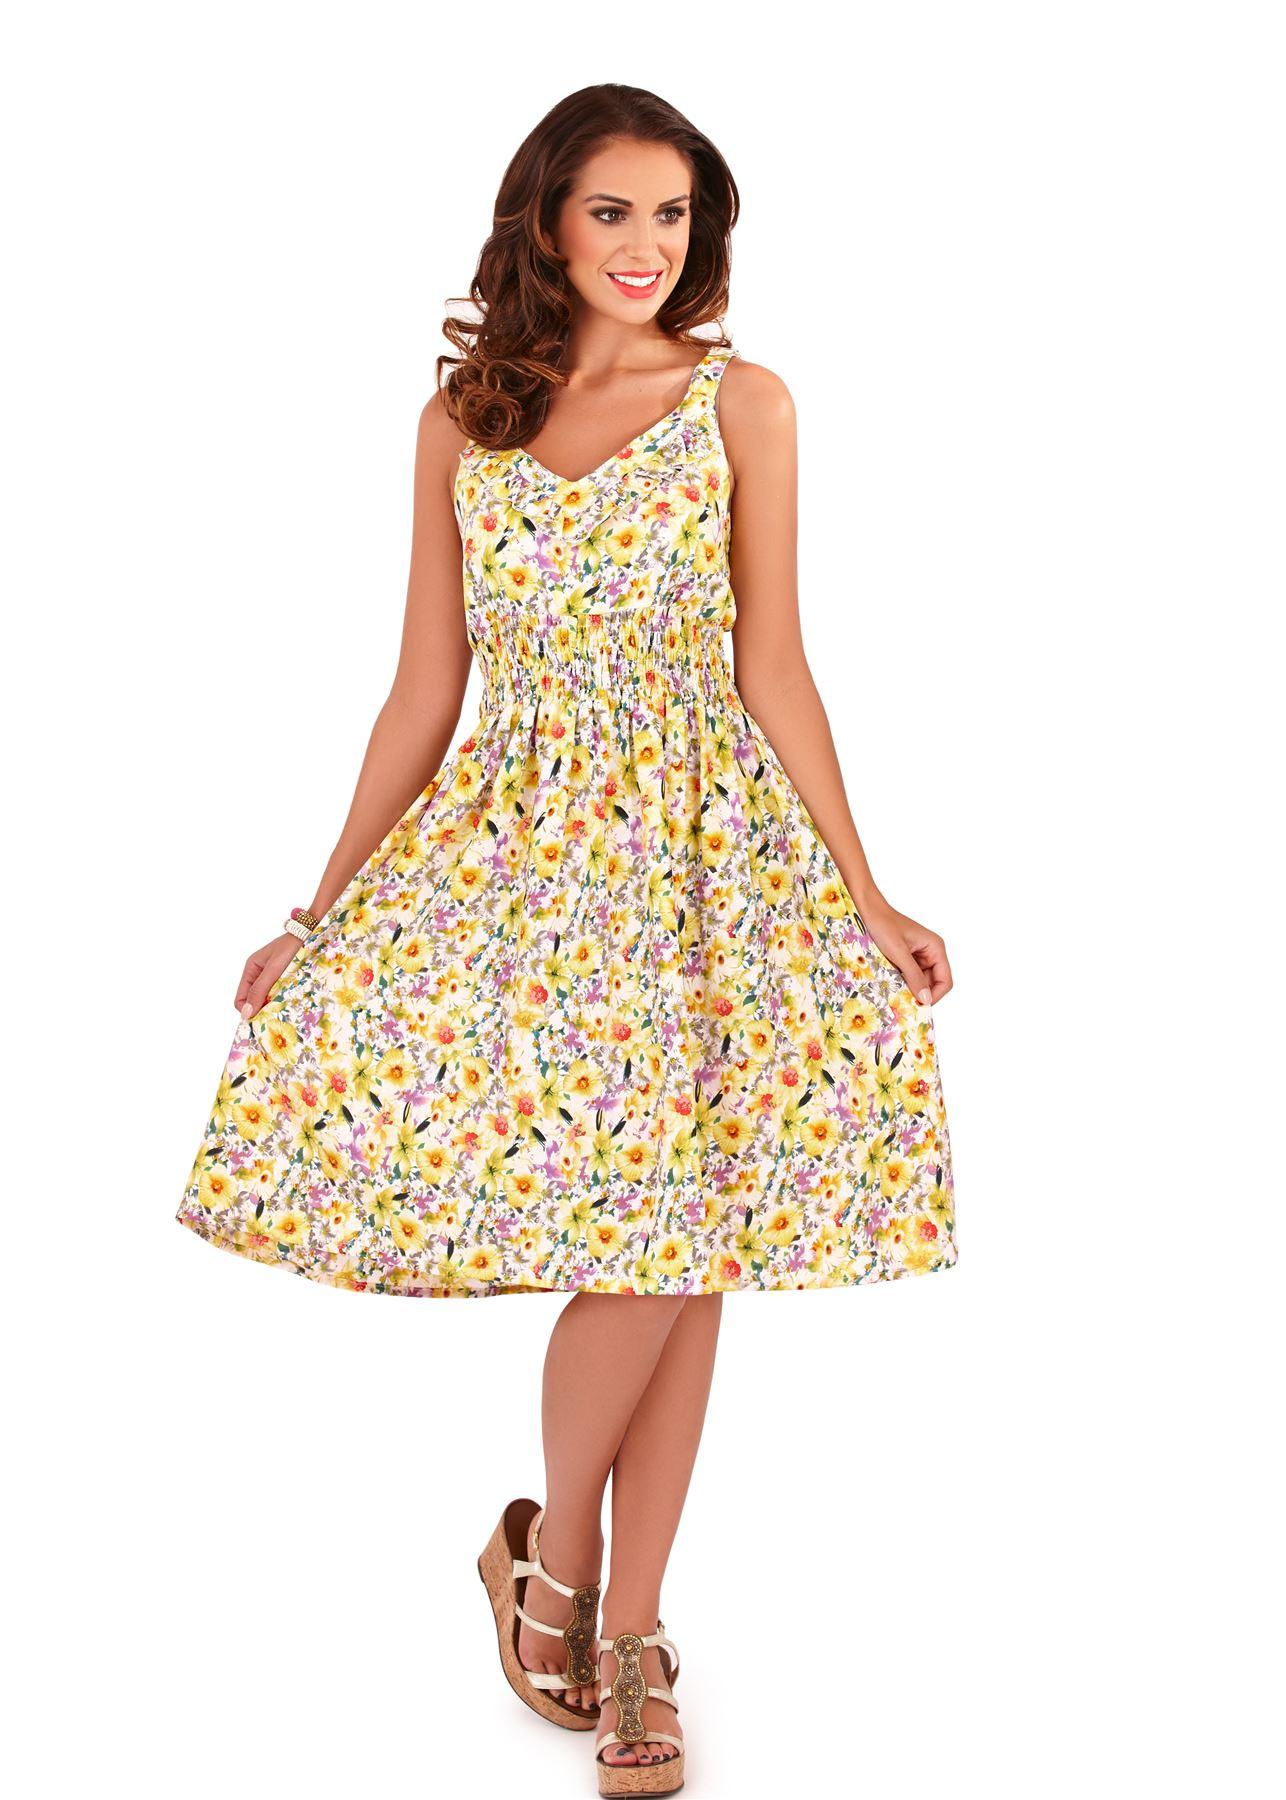 Summer dresses u k good